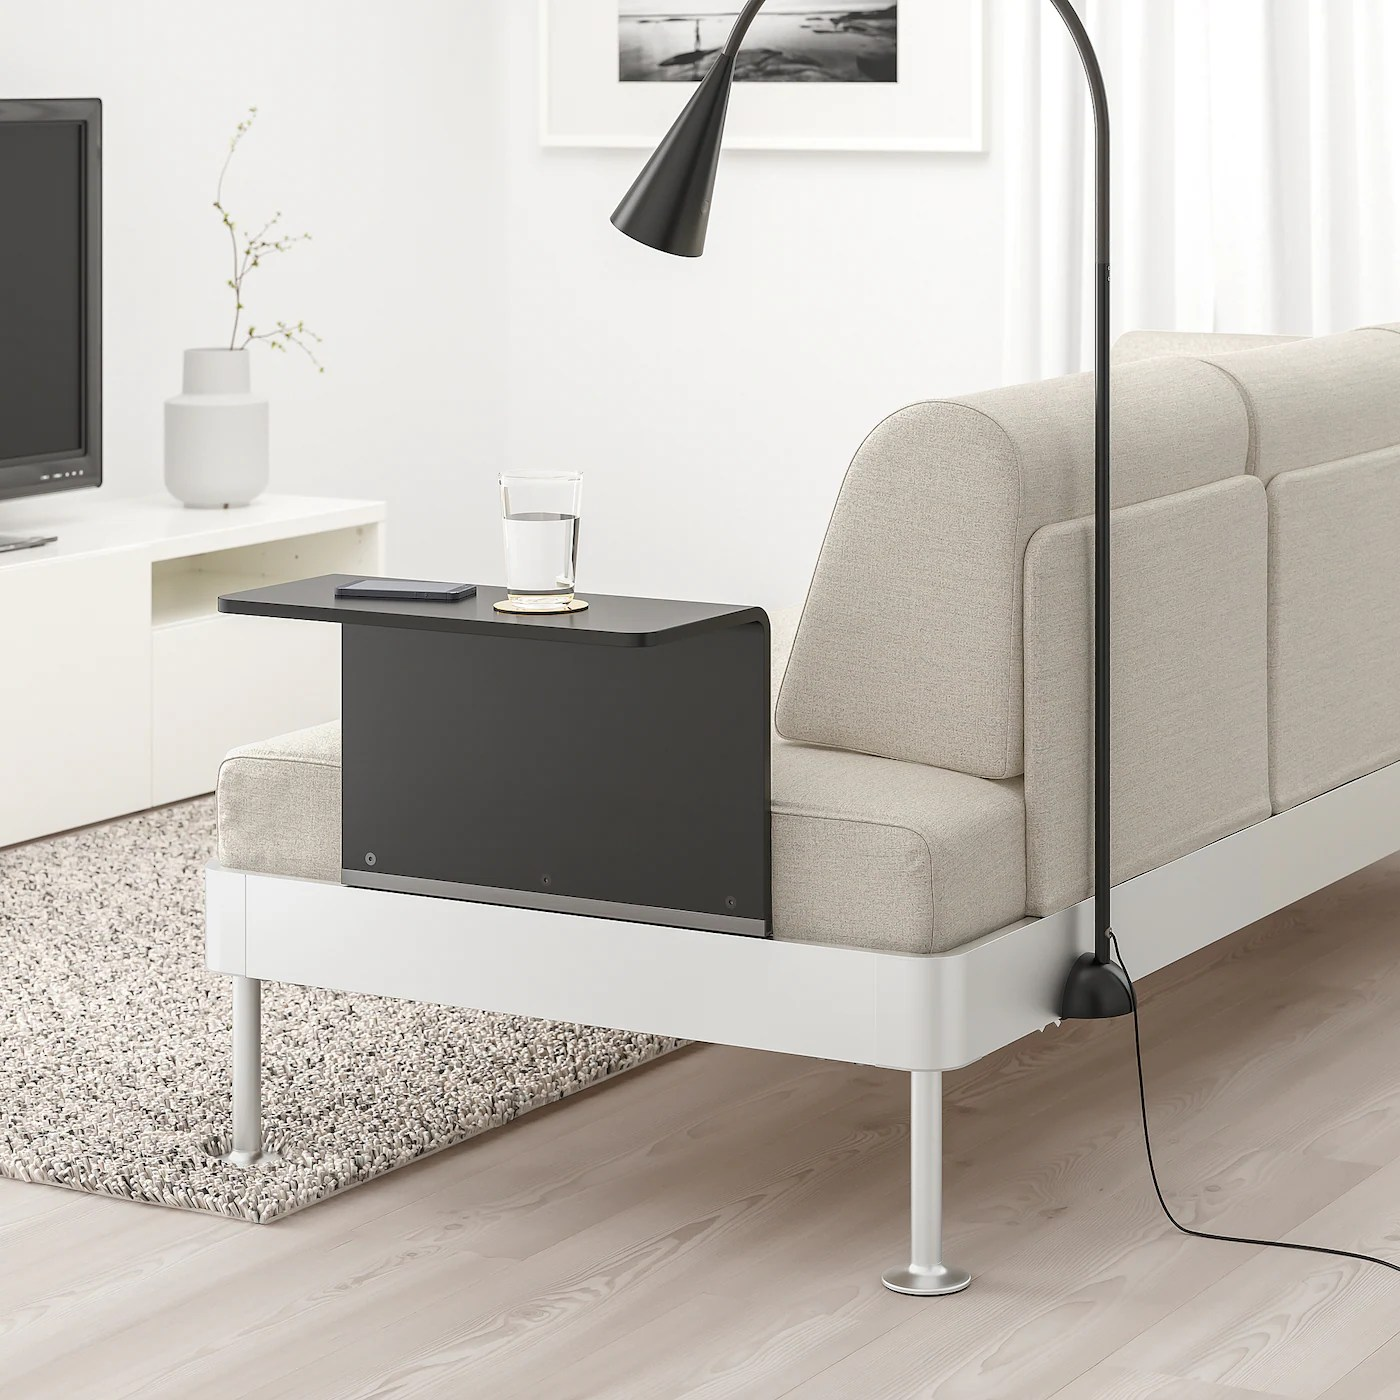 Https Www Ikea Com No No P Delaktig 3 Seters Sofa Med Bord Og Lampe Gunnared Beige S19289077 Ikea